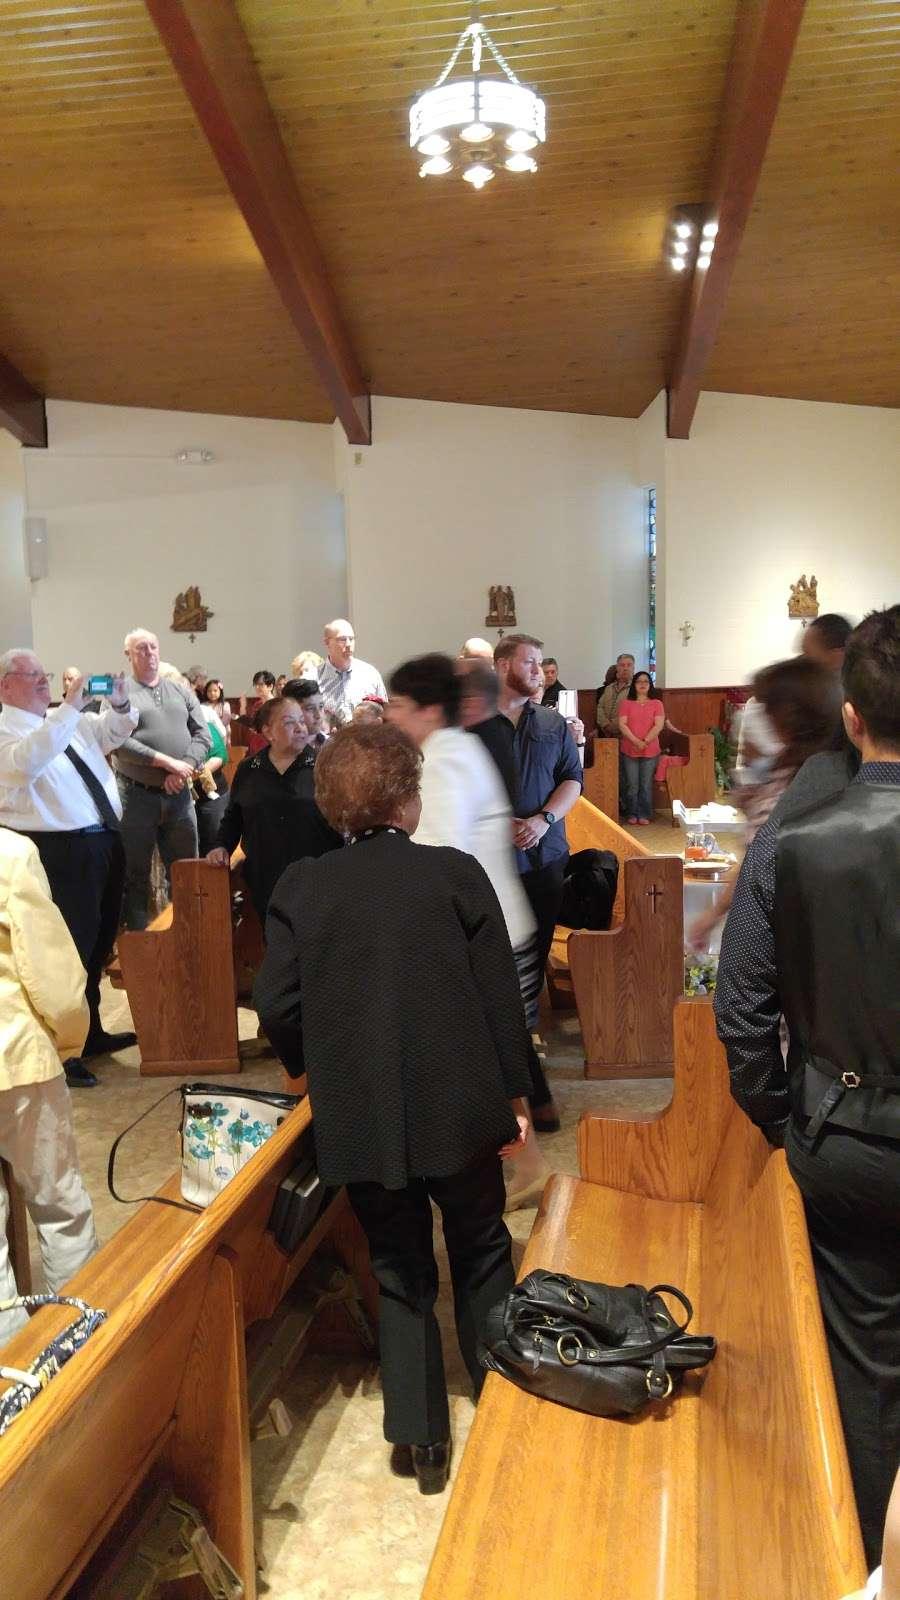 St. Margarets of Cortona Church - church  | Photo 6 of 10 | Address: 31 Chamberlain Ave, Little Ferry, NJ 07643, USA | Phone: (201) 641-2988